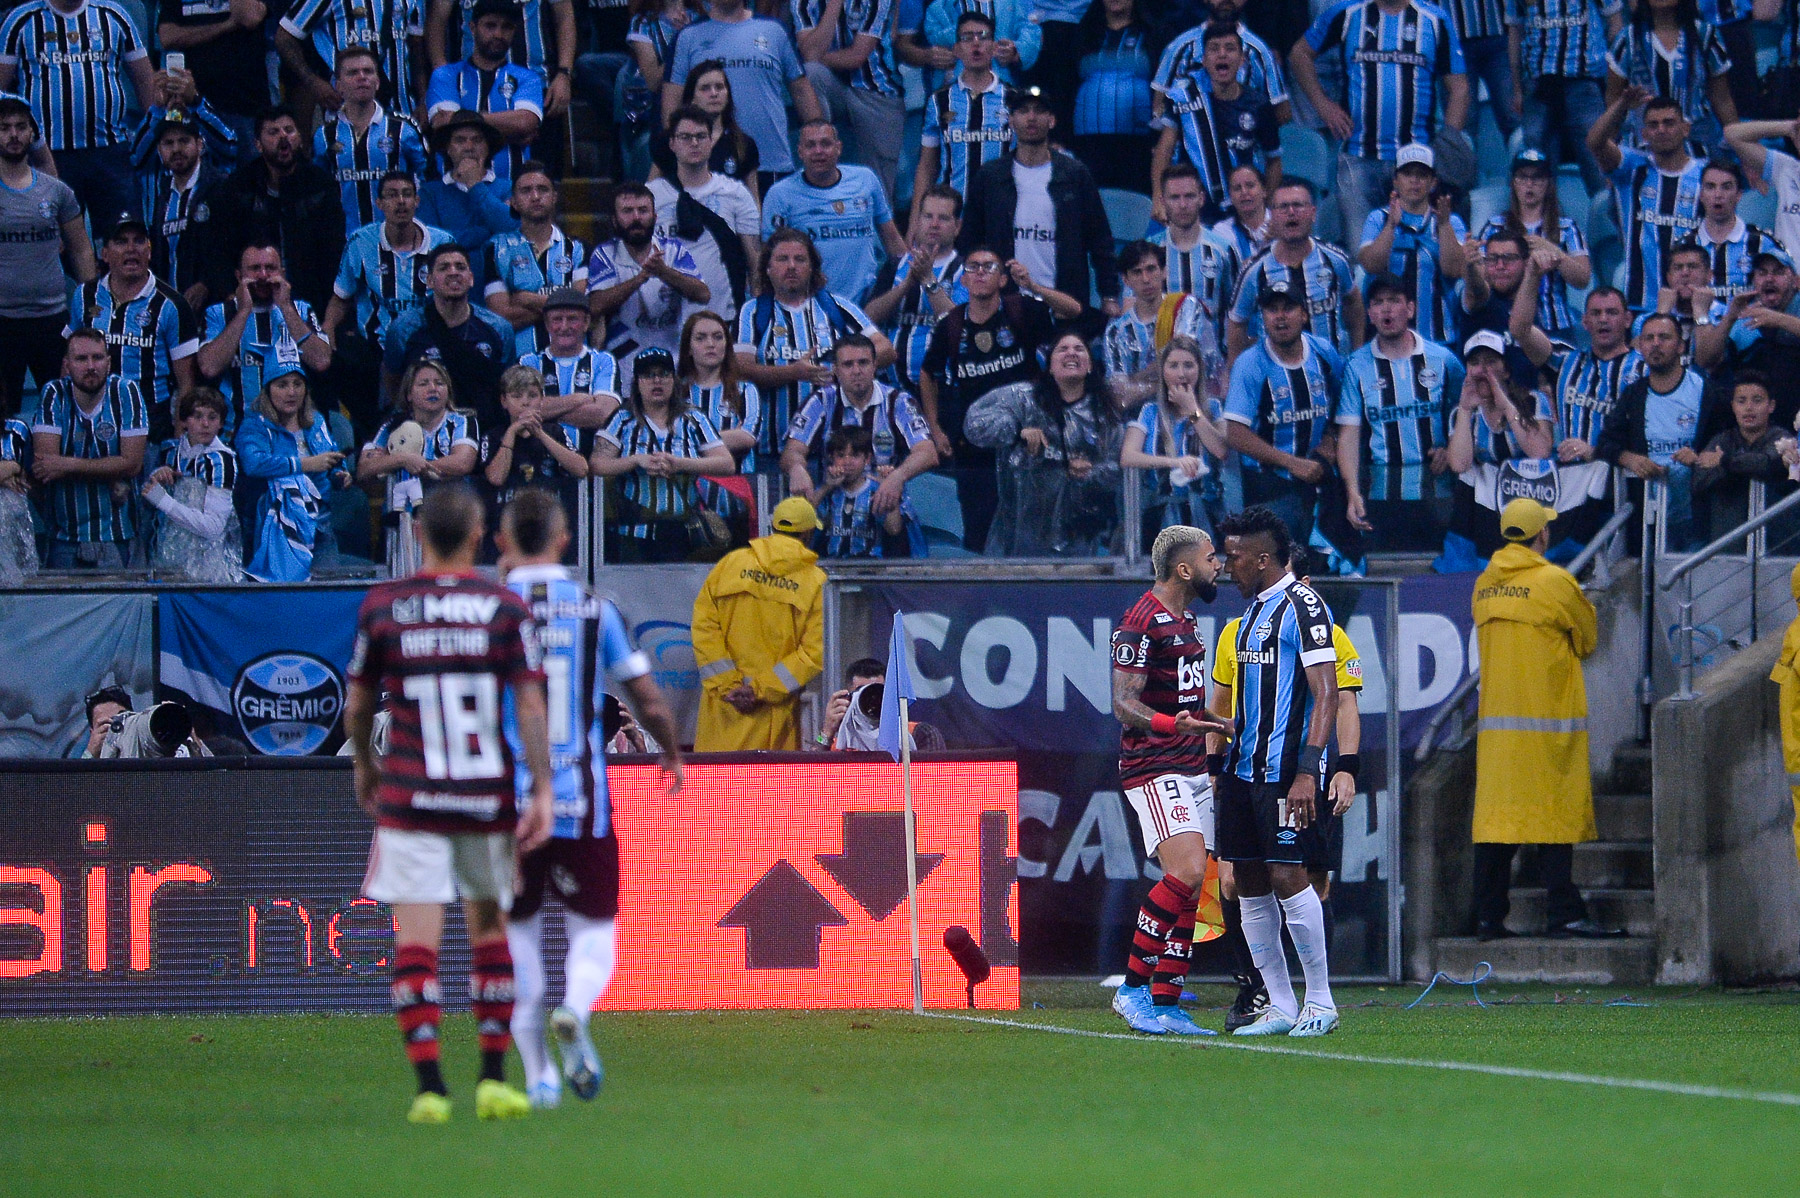 Gremio_X_Flamengo_dudabairros_Eleven_129